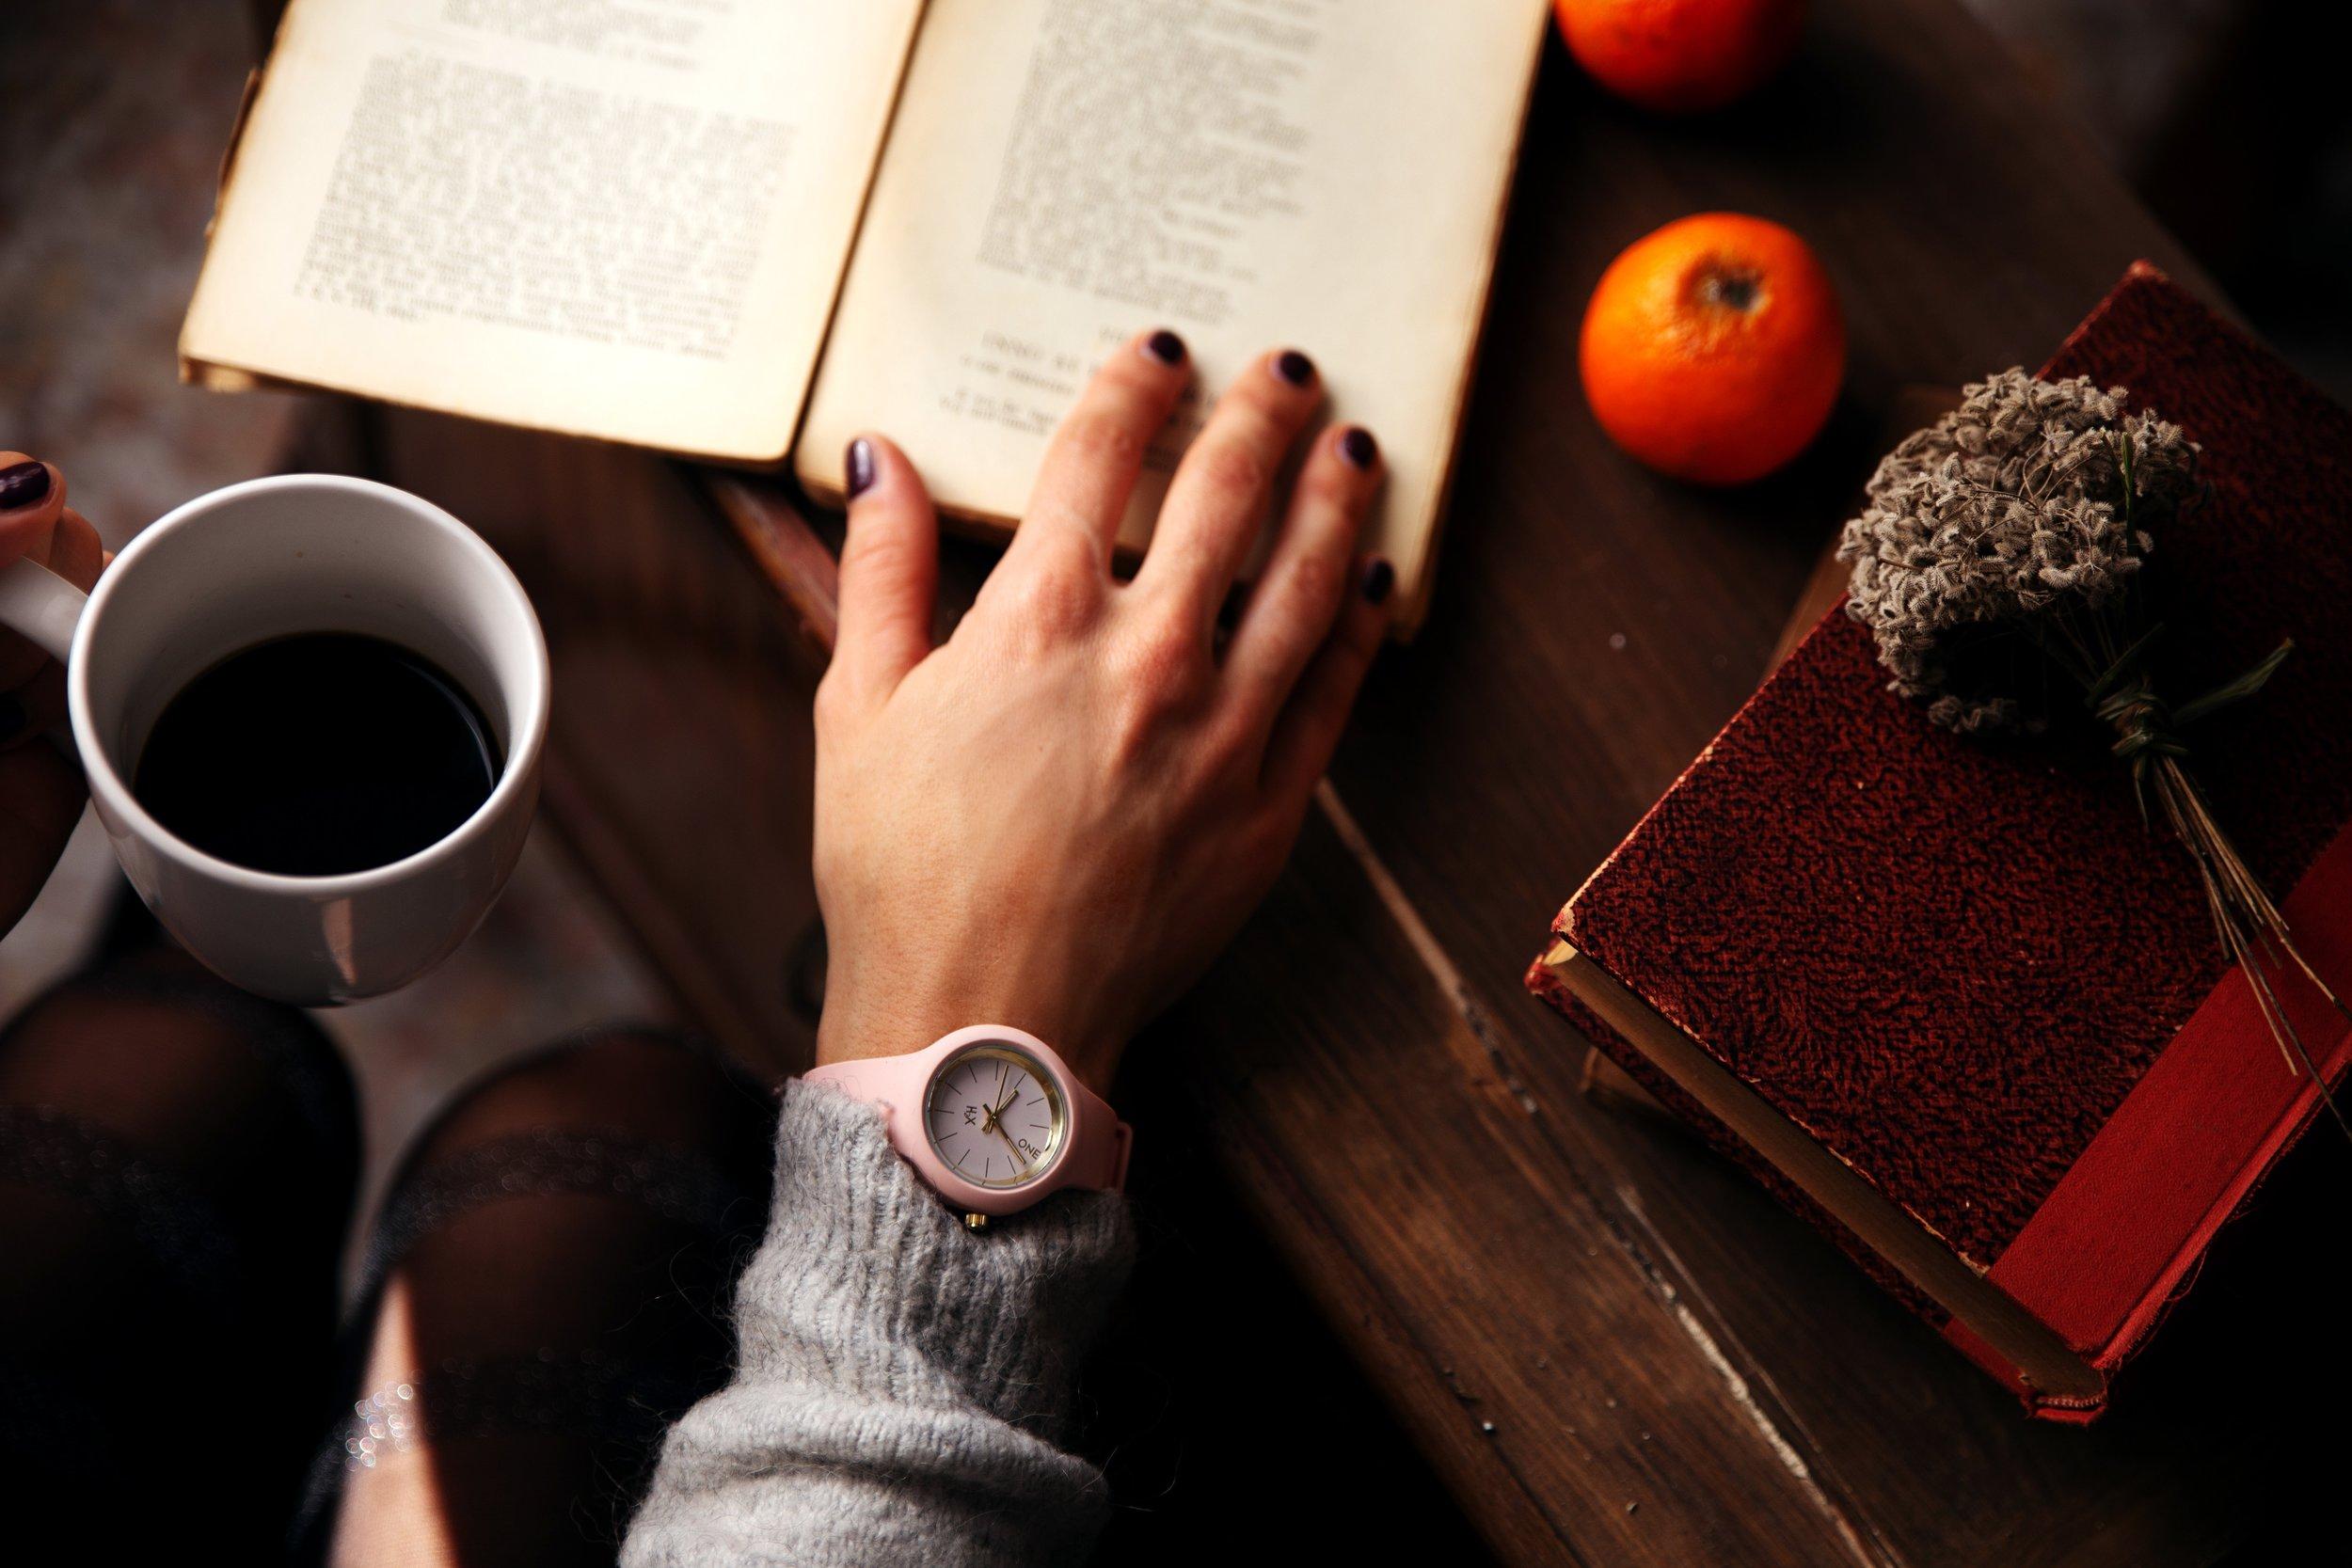 accessory-book-caffeine-1550649.jpg